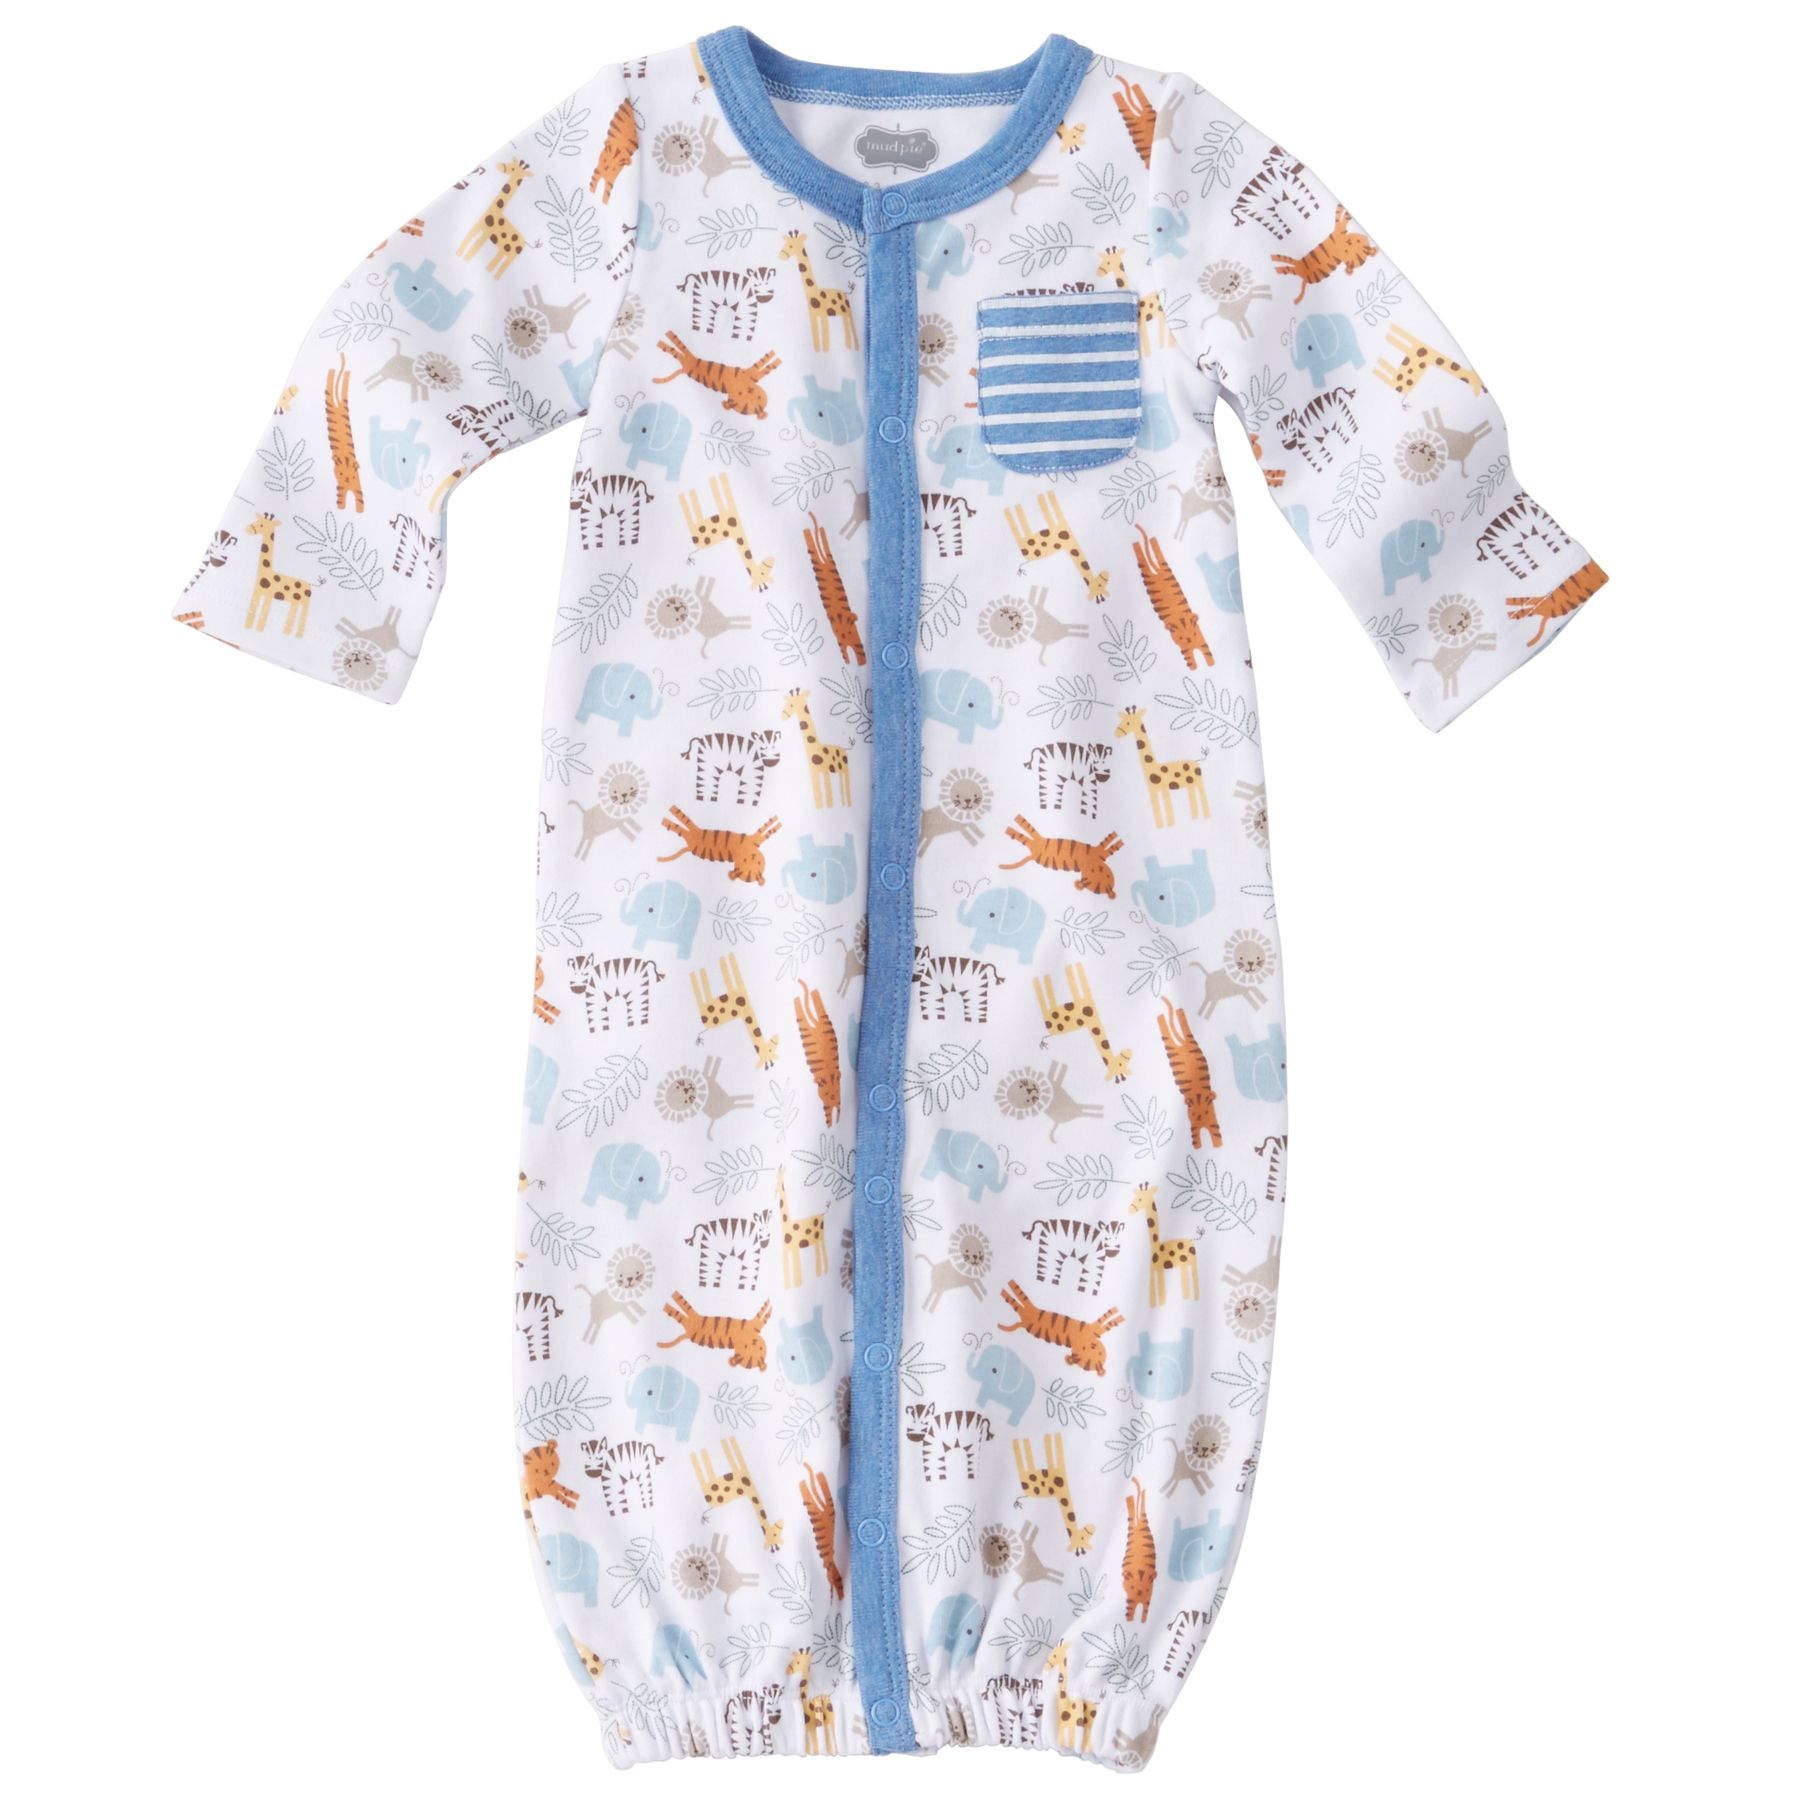 Mud Pie Baby Boy Christmas Green Sleep Gown Sack Plaid Tie Size 0-3 Months